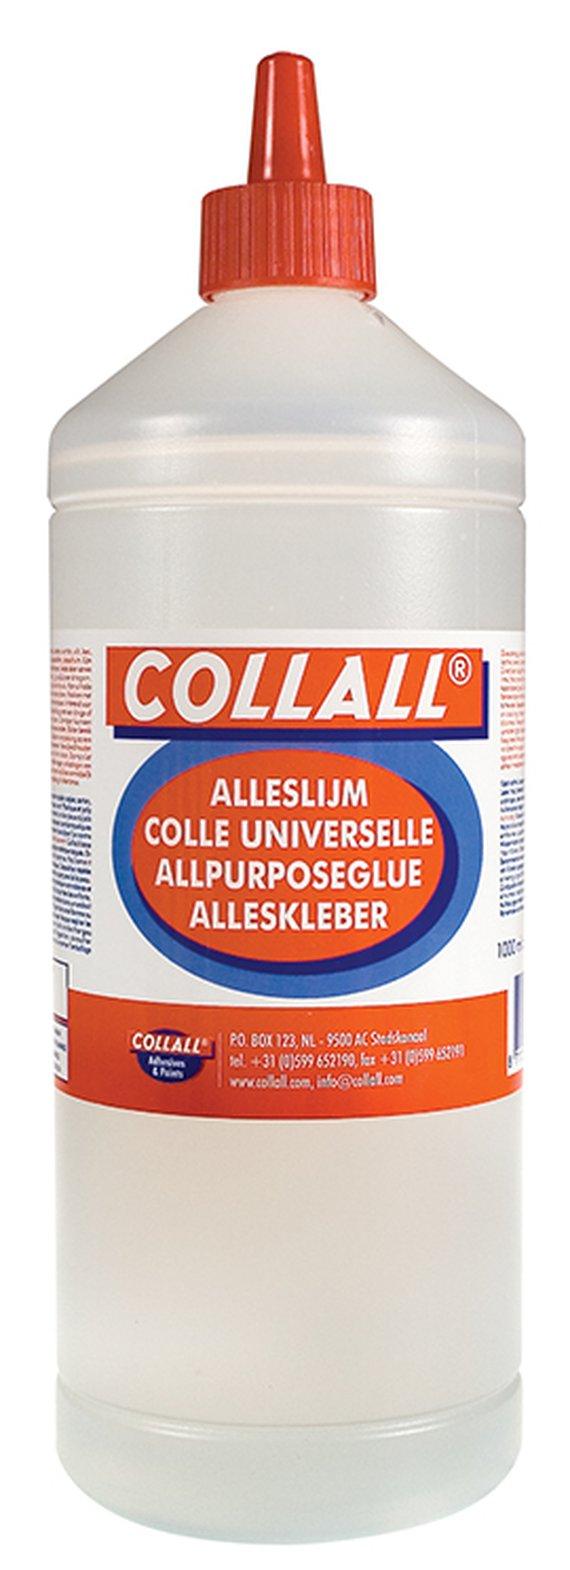 Collall Klebstoff